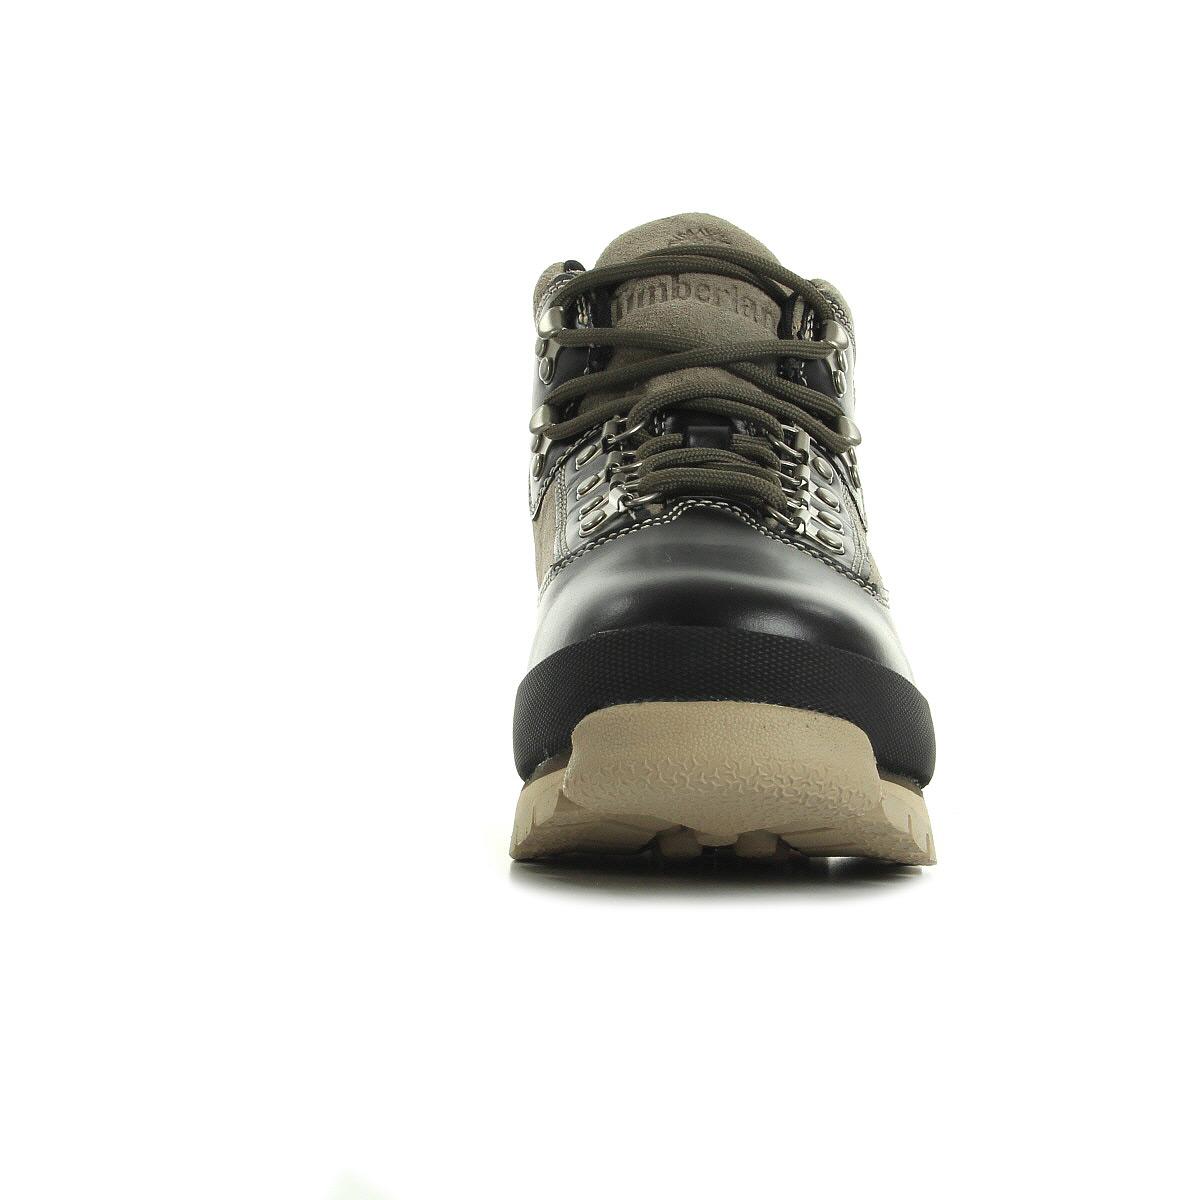 Timberland Euro Hiker Black